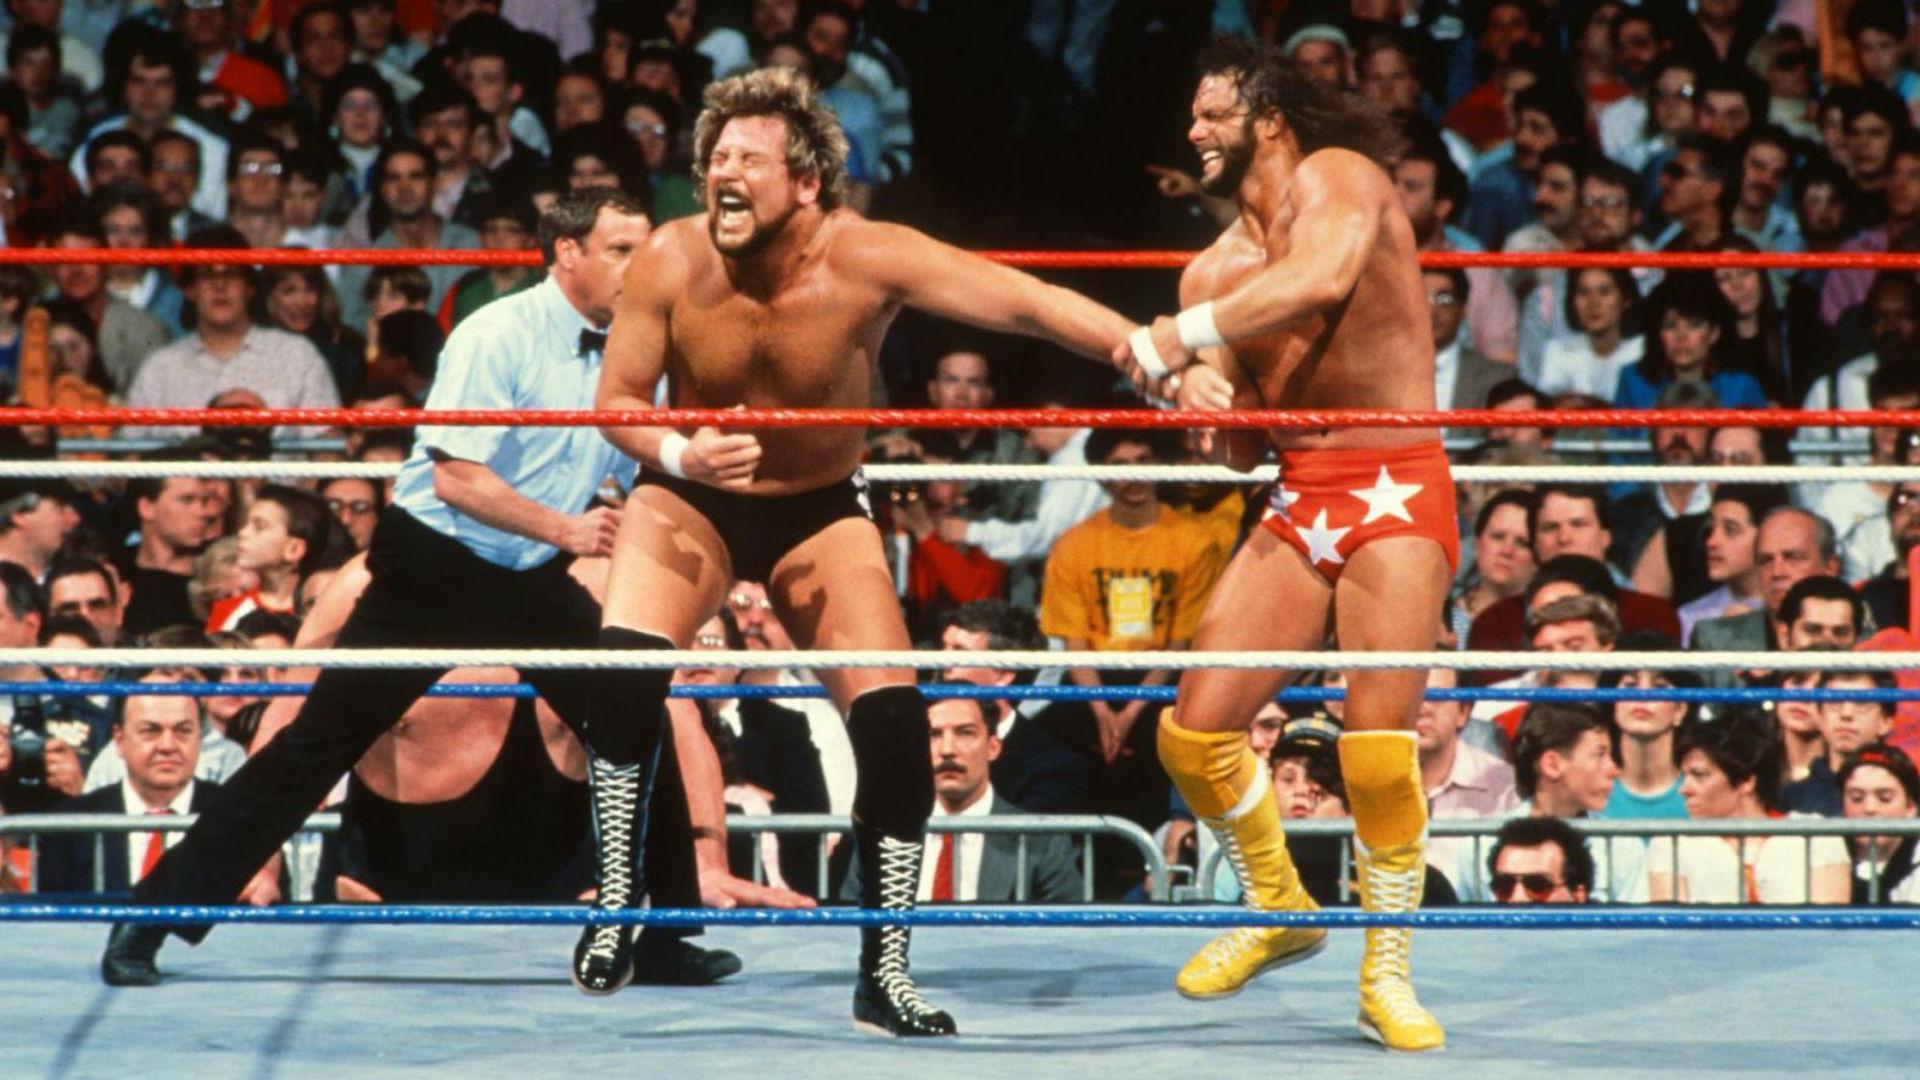 Wwe Wrestlemania 4 Match Grades Macho Man Randy Savage Wins